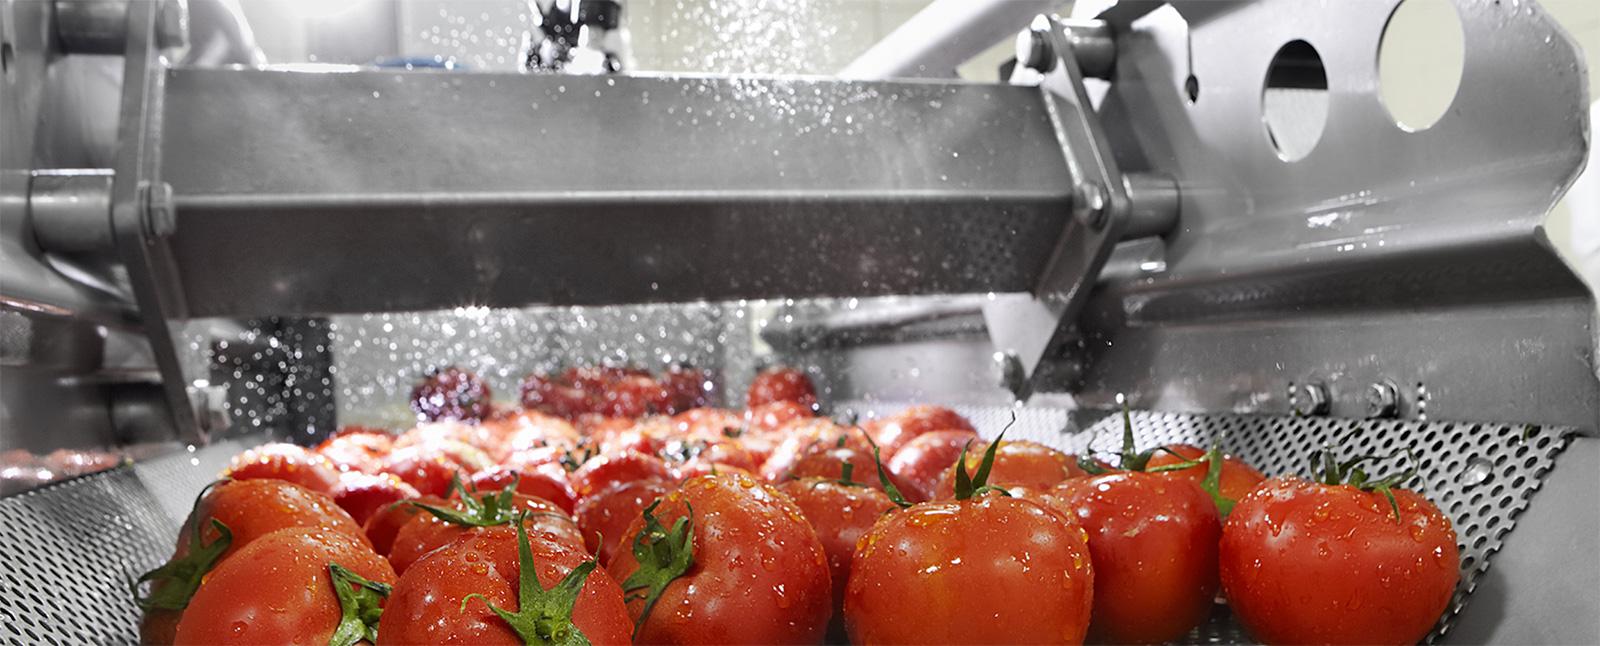 Wonderfil Tomato Factory